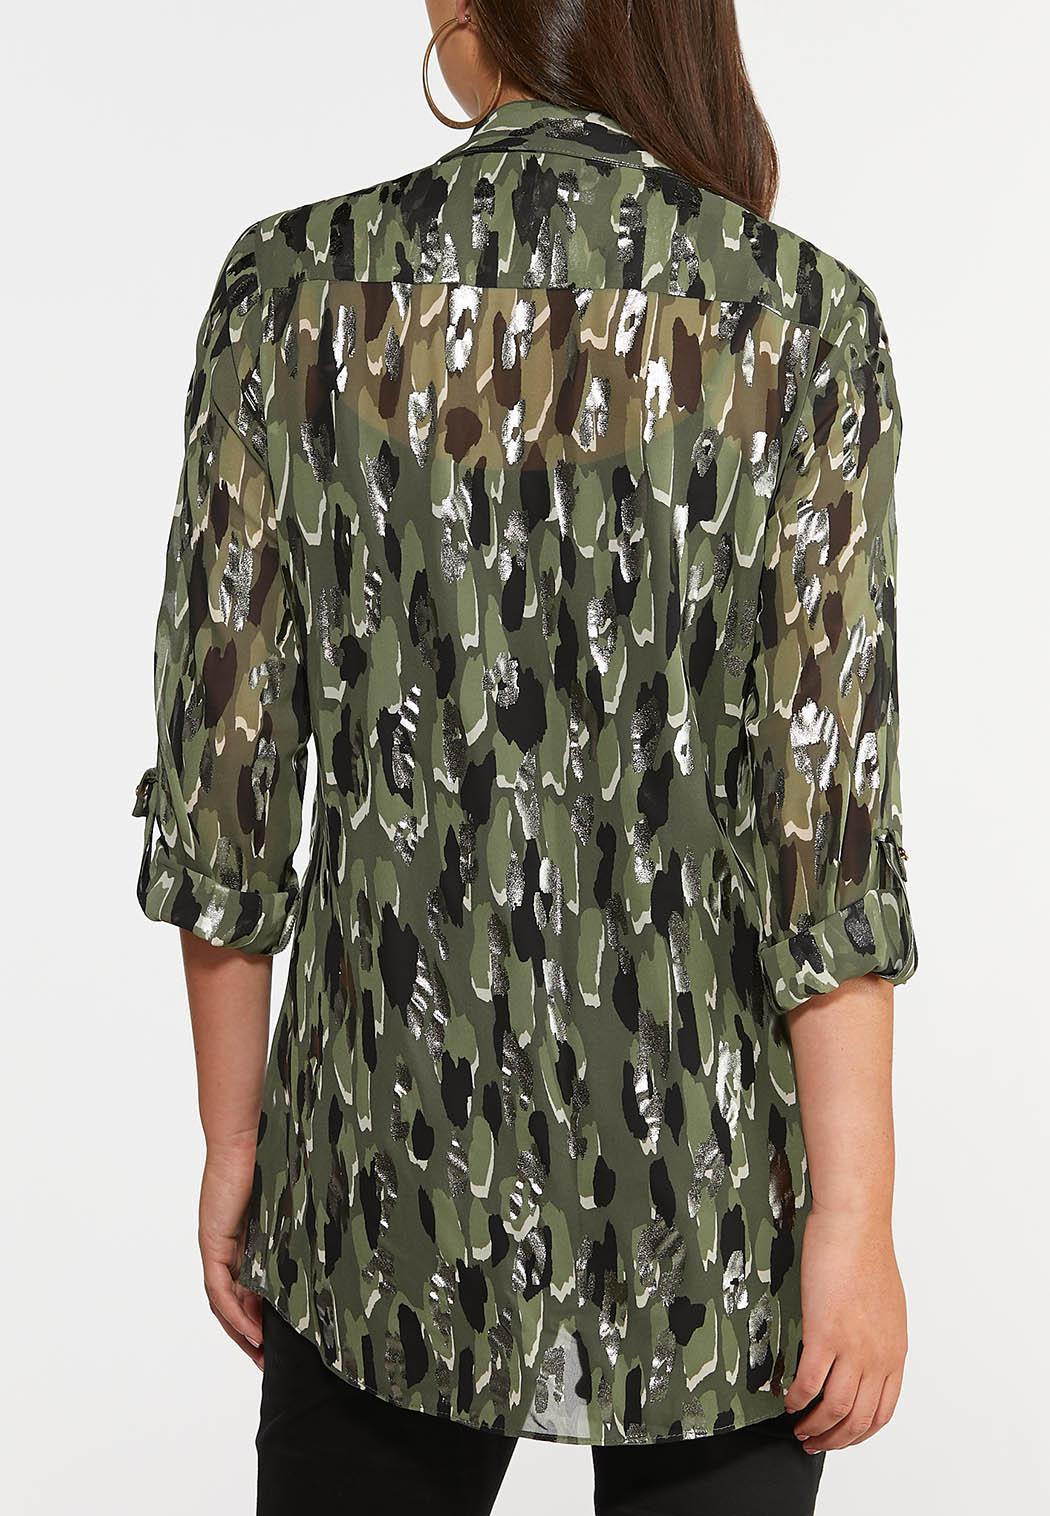 Olive Foil Equipment Shirt (Item #44353631)